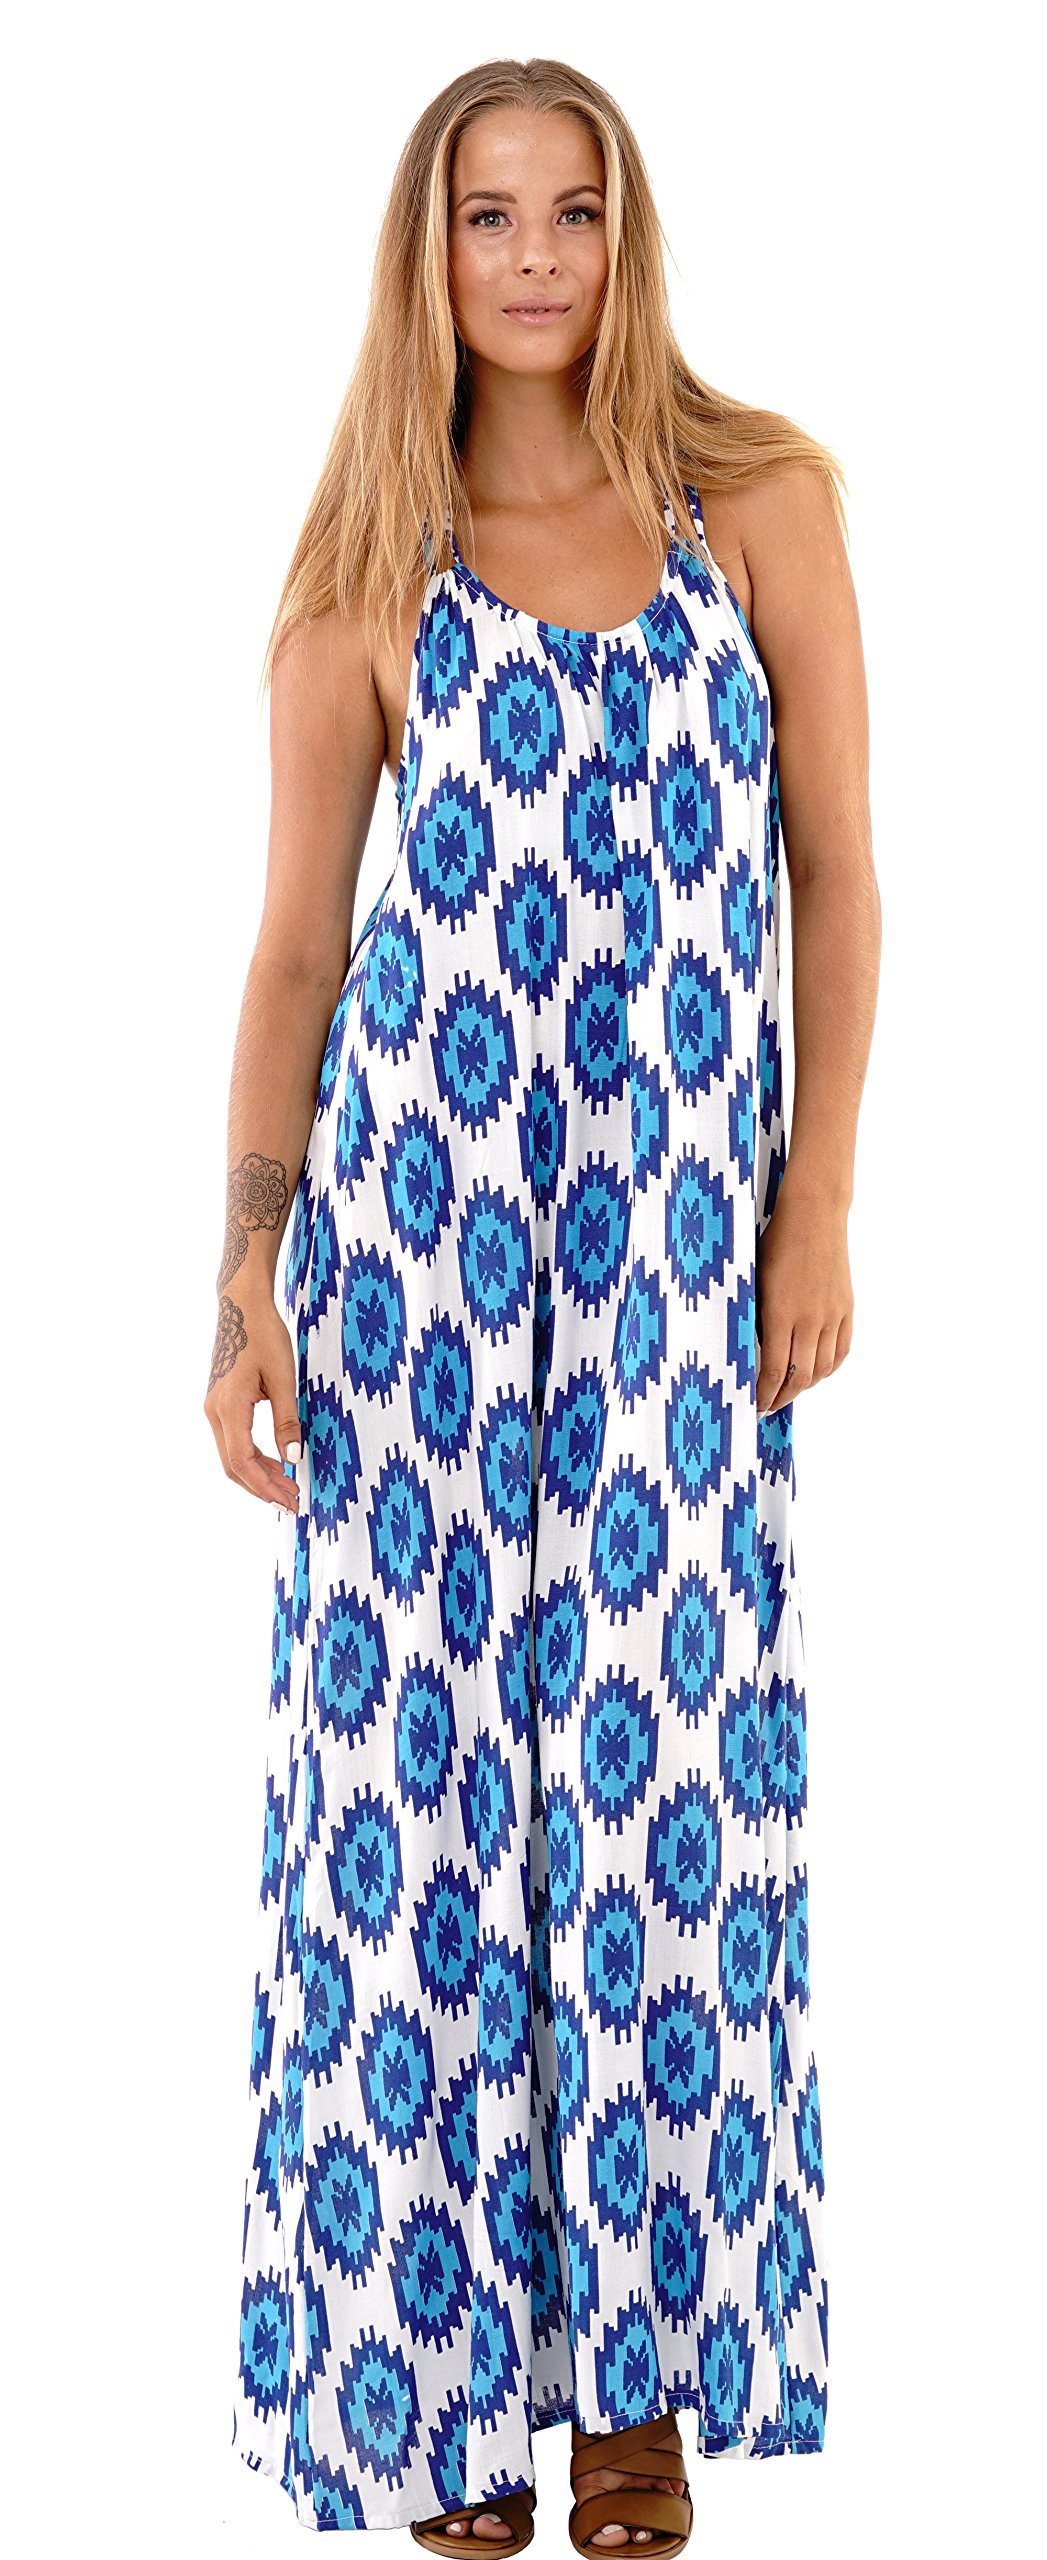 Available at Amazon: SHU-SHI Women's Sleeveless Bohemian Summer Maxi Dress Casual Long Beach Dresses